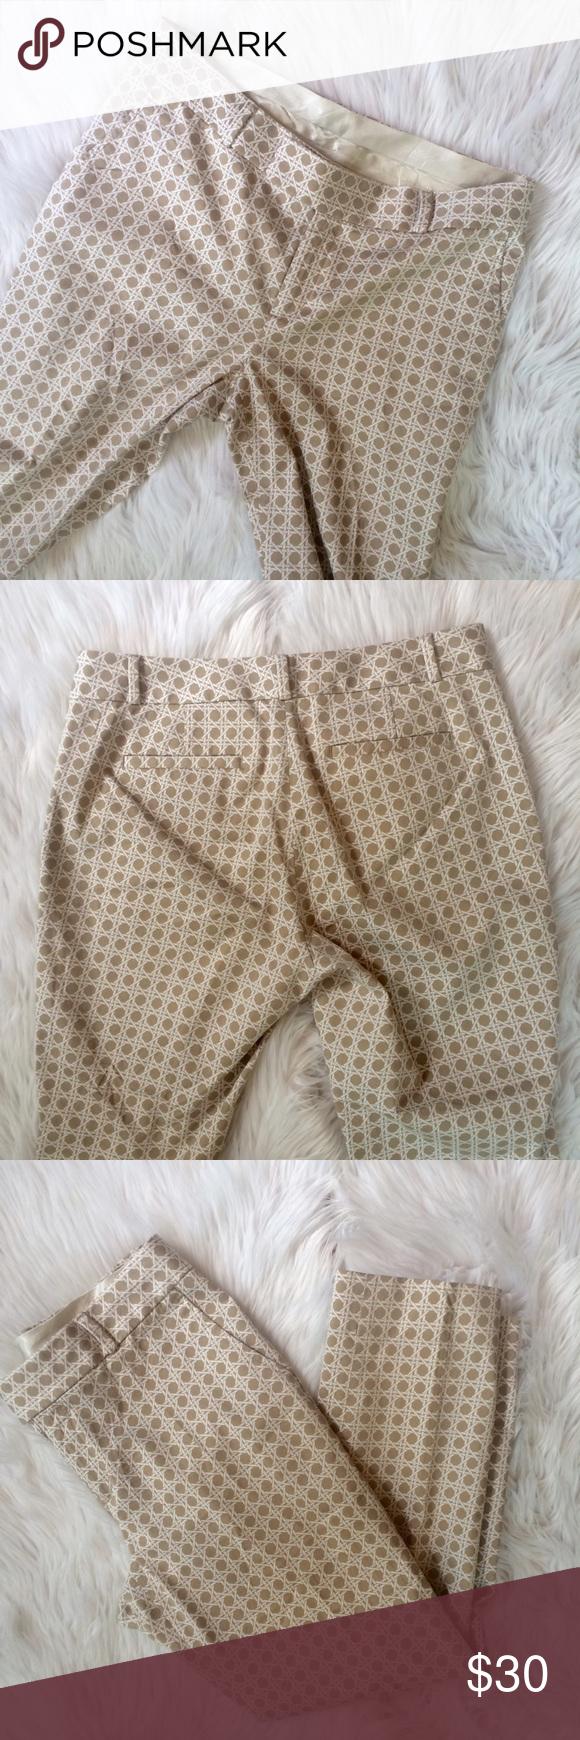 "❤️❤️ PRINT DRESS PANTS EUC. 98% cotton 2% elastane. 16.25"" waist 35"" length 26"" inseam   **bundles save 10%** no trades/no modeling/no asking for lowest Banana Republic Pants Straight Leg"